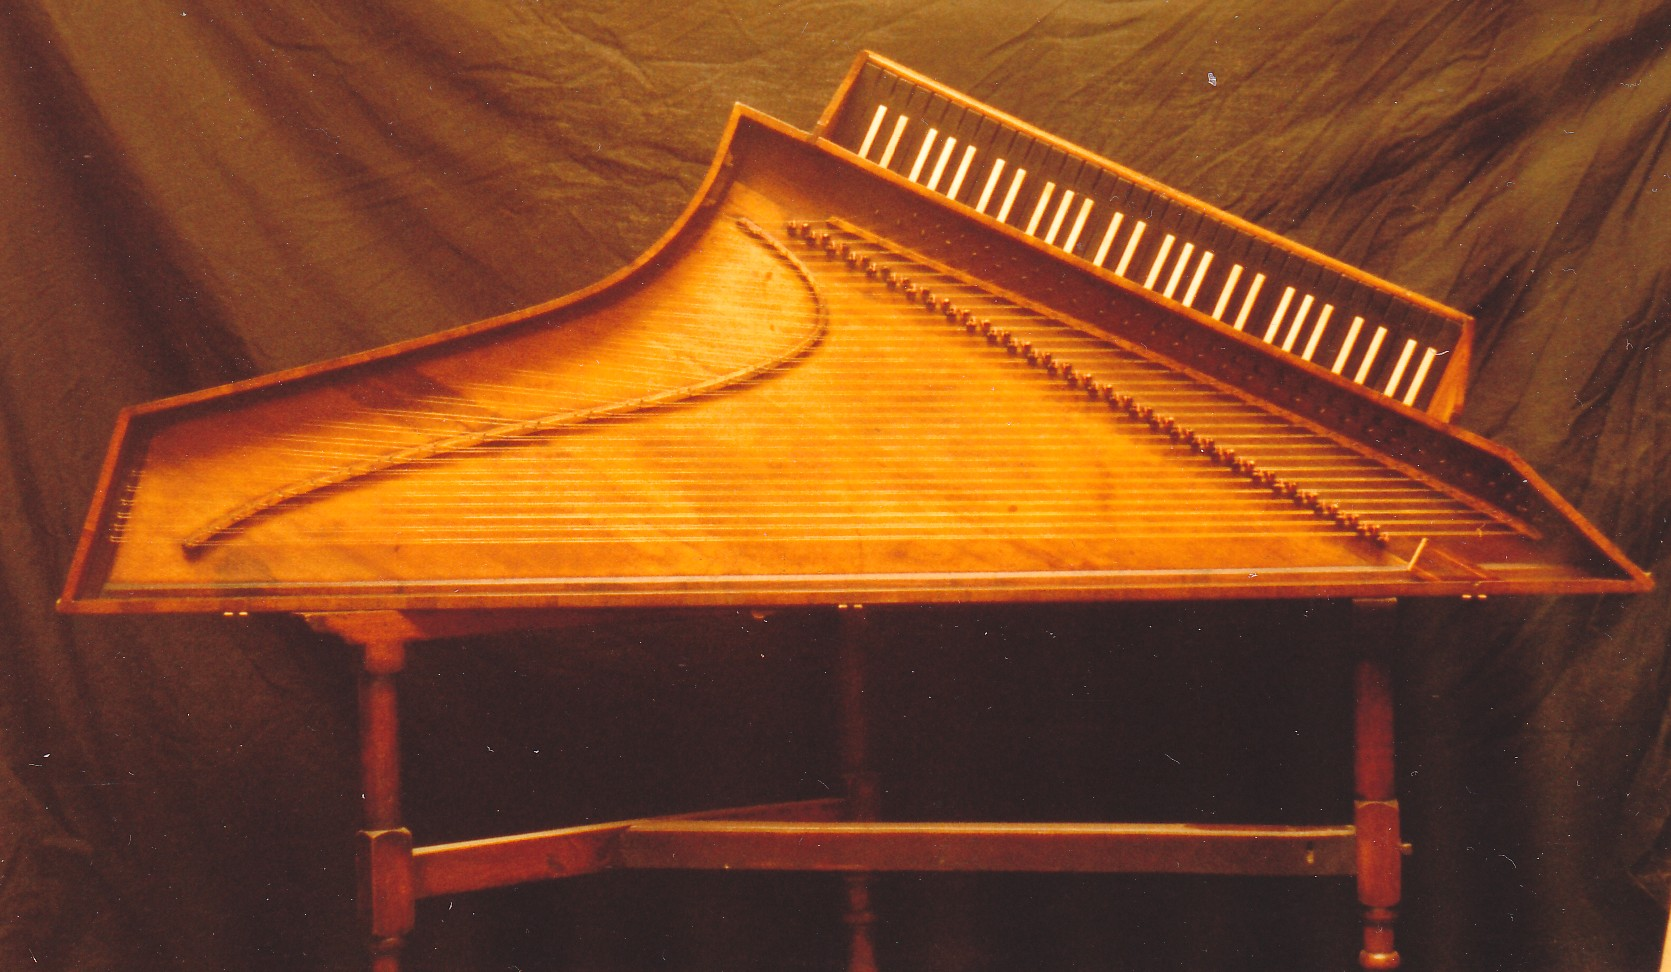 Thomas Haxby 1764 spinet